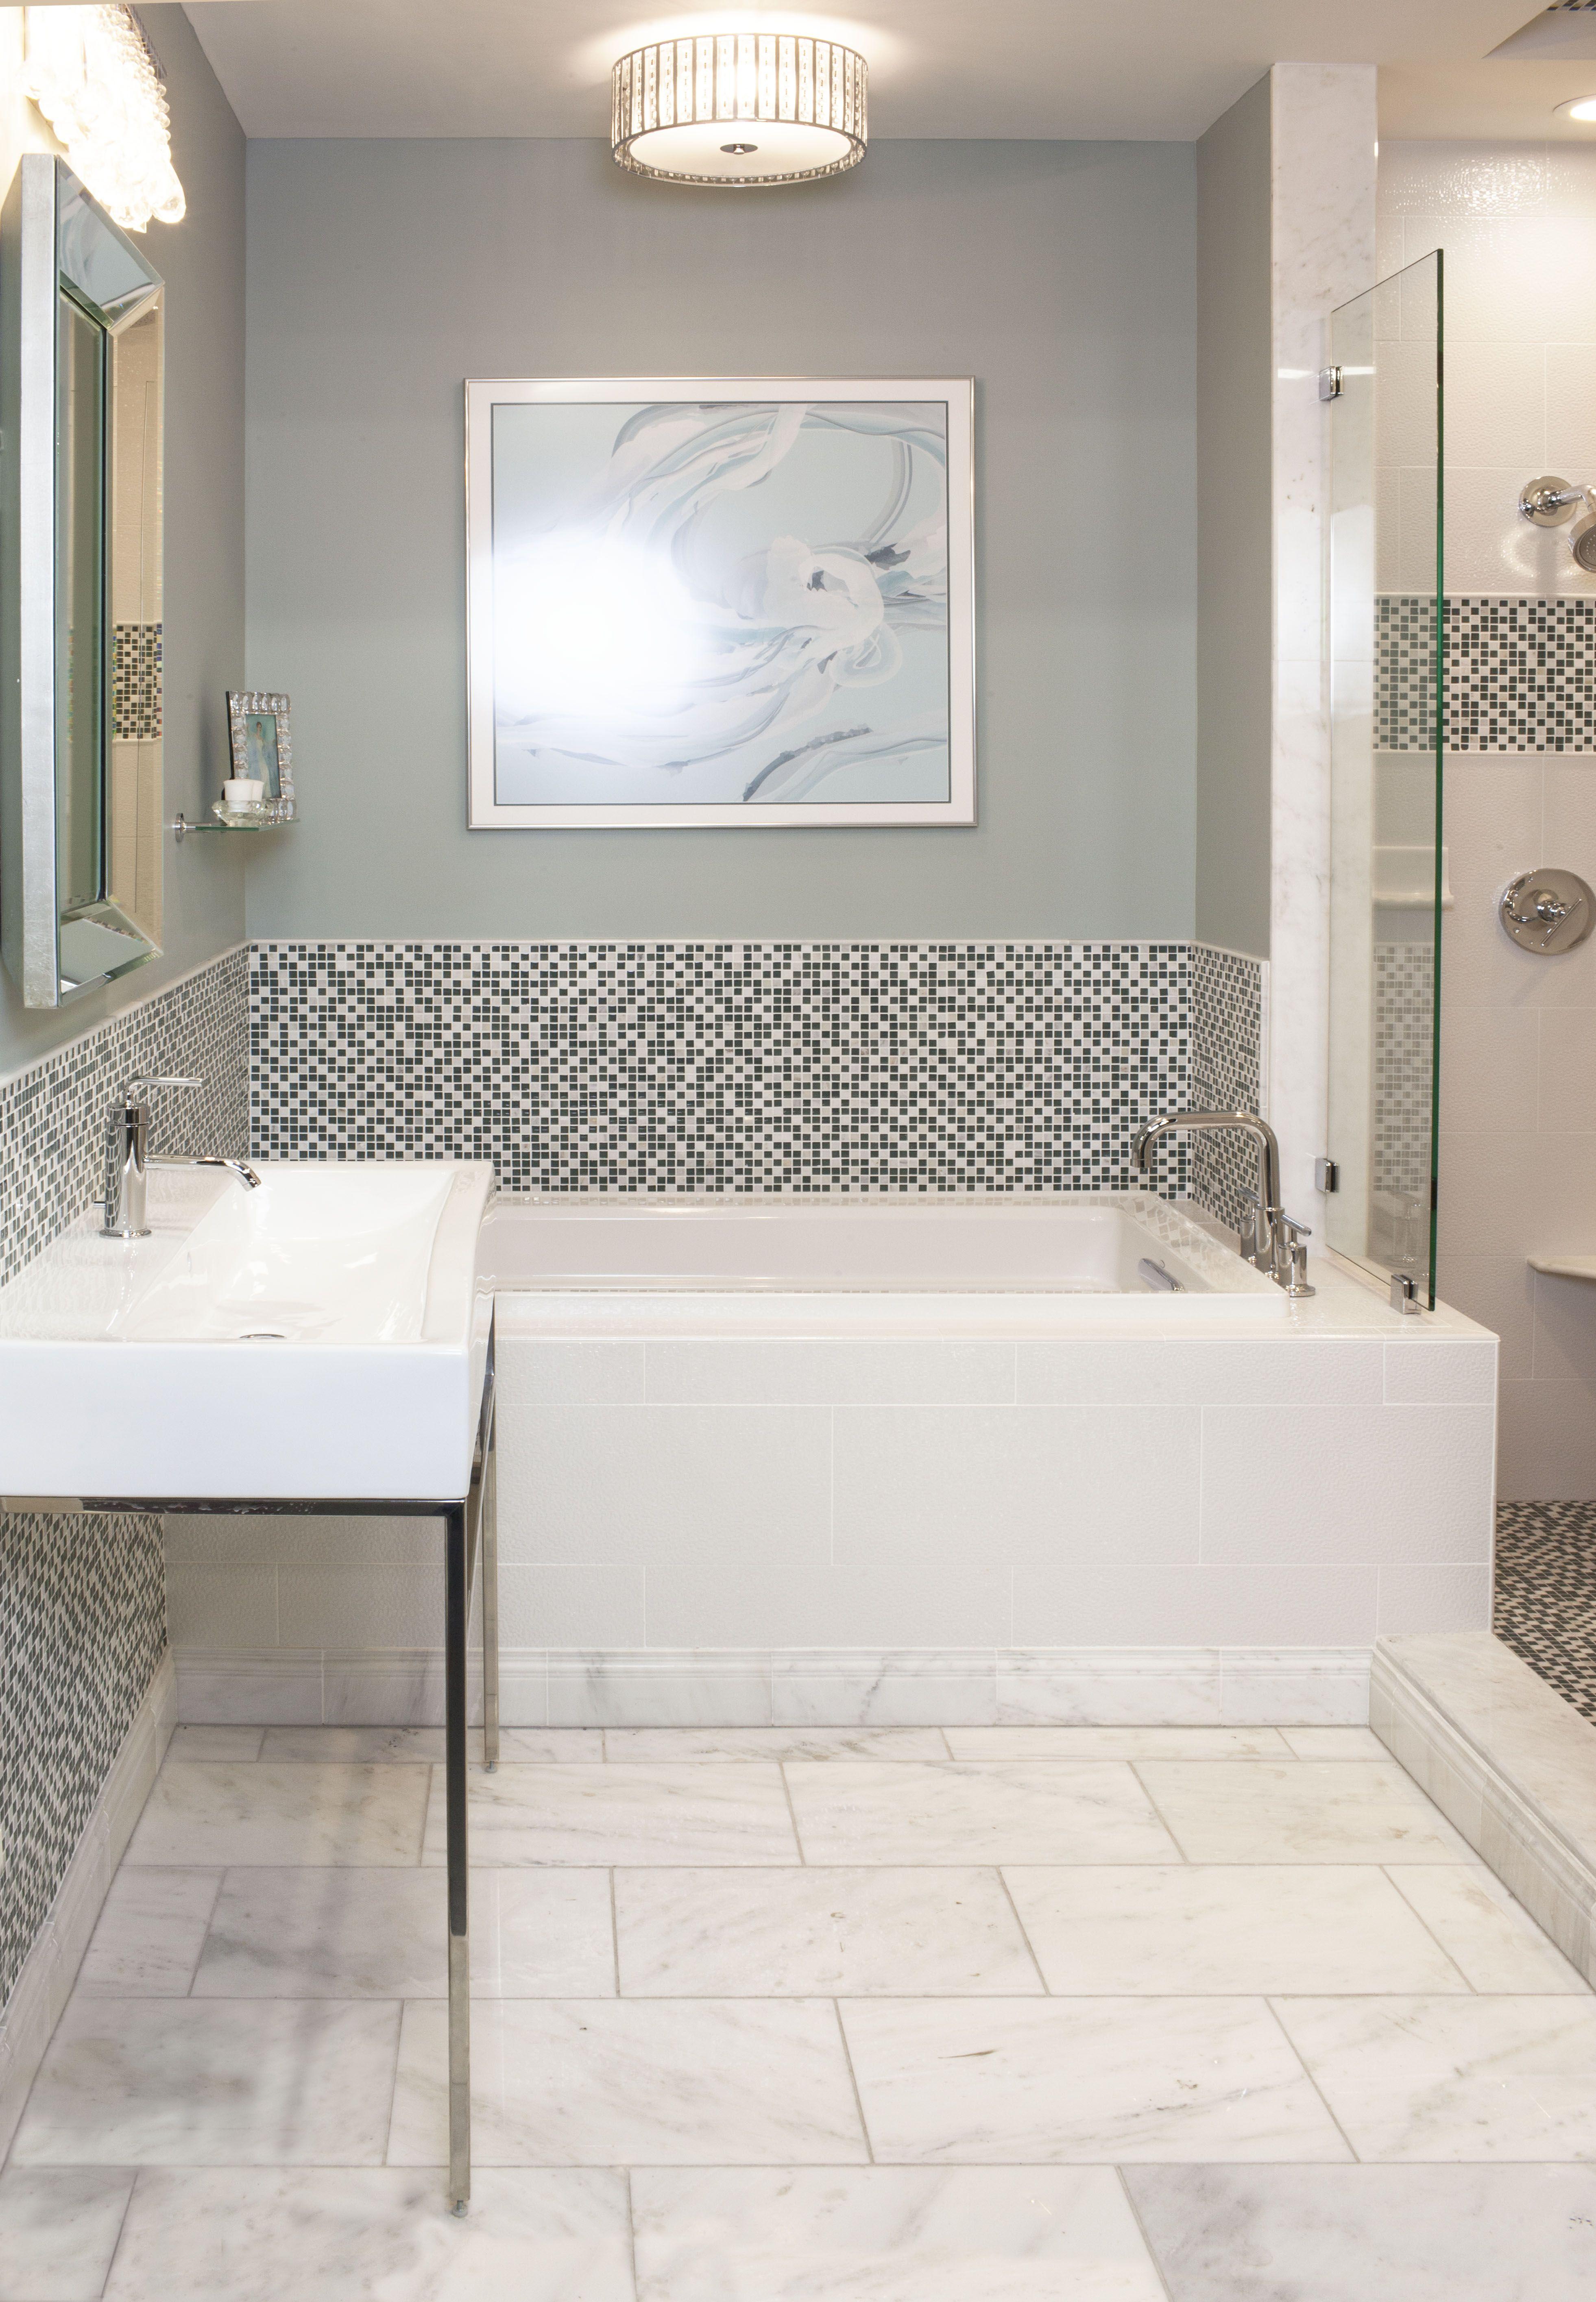 Modern marble and glass mosaic bathroom #thetileshop | Bathroom ...